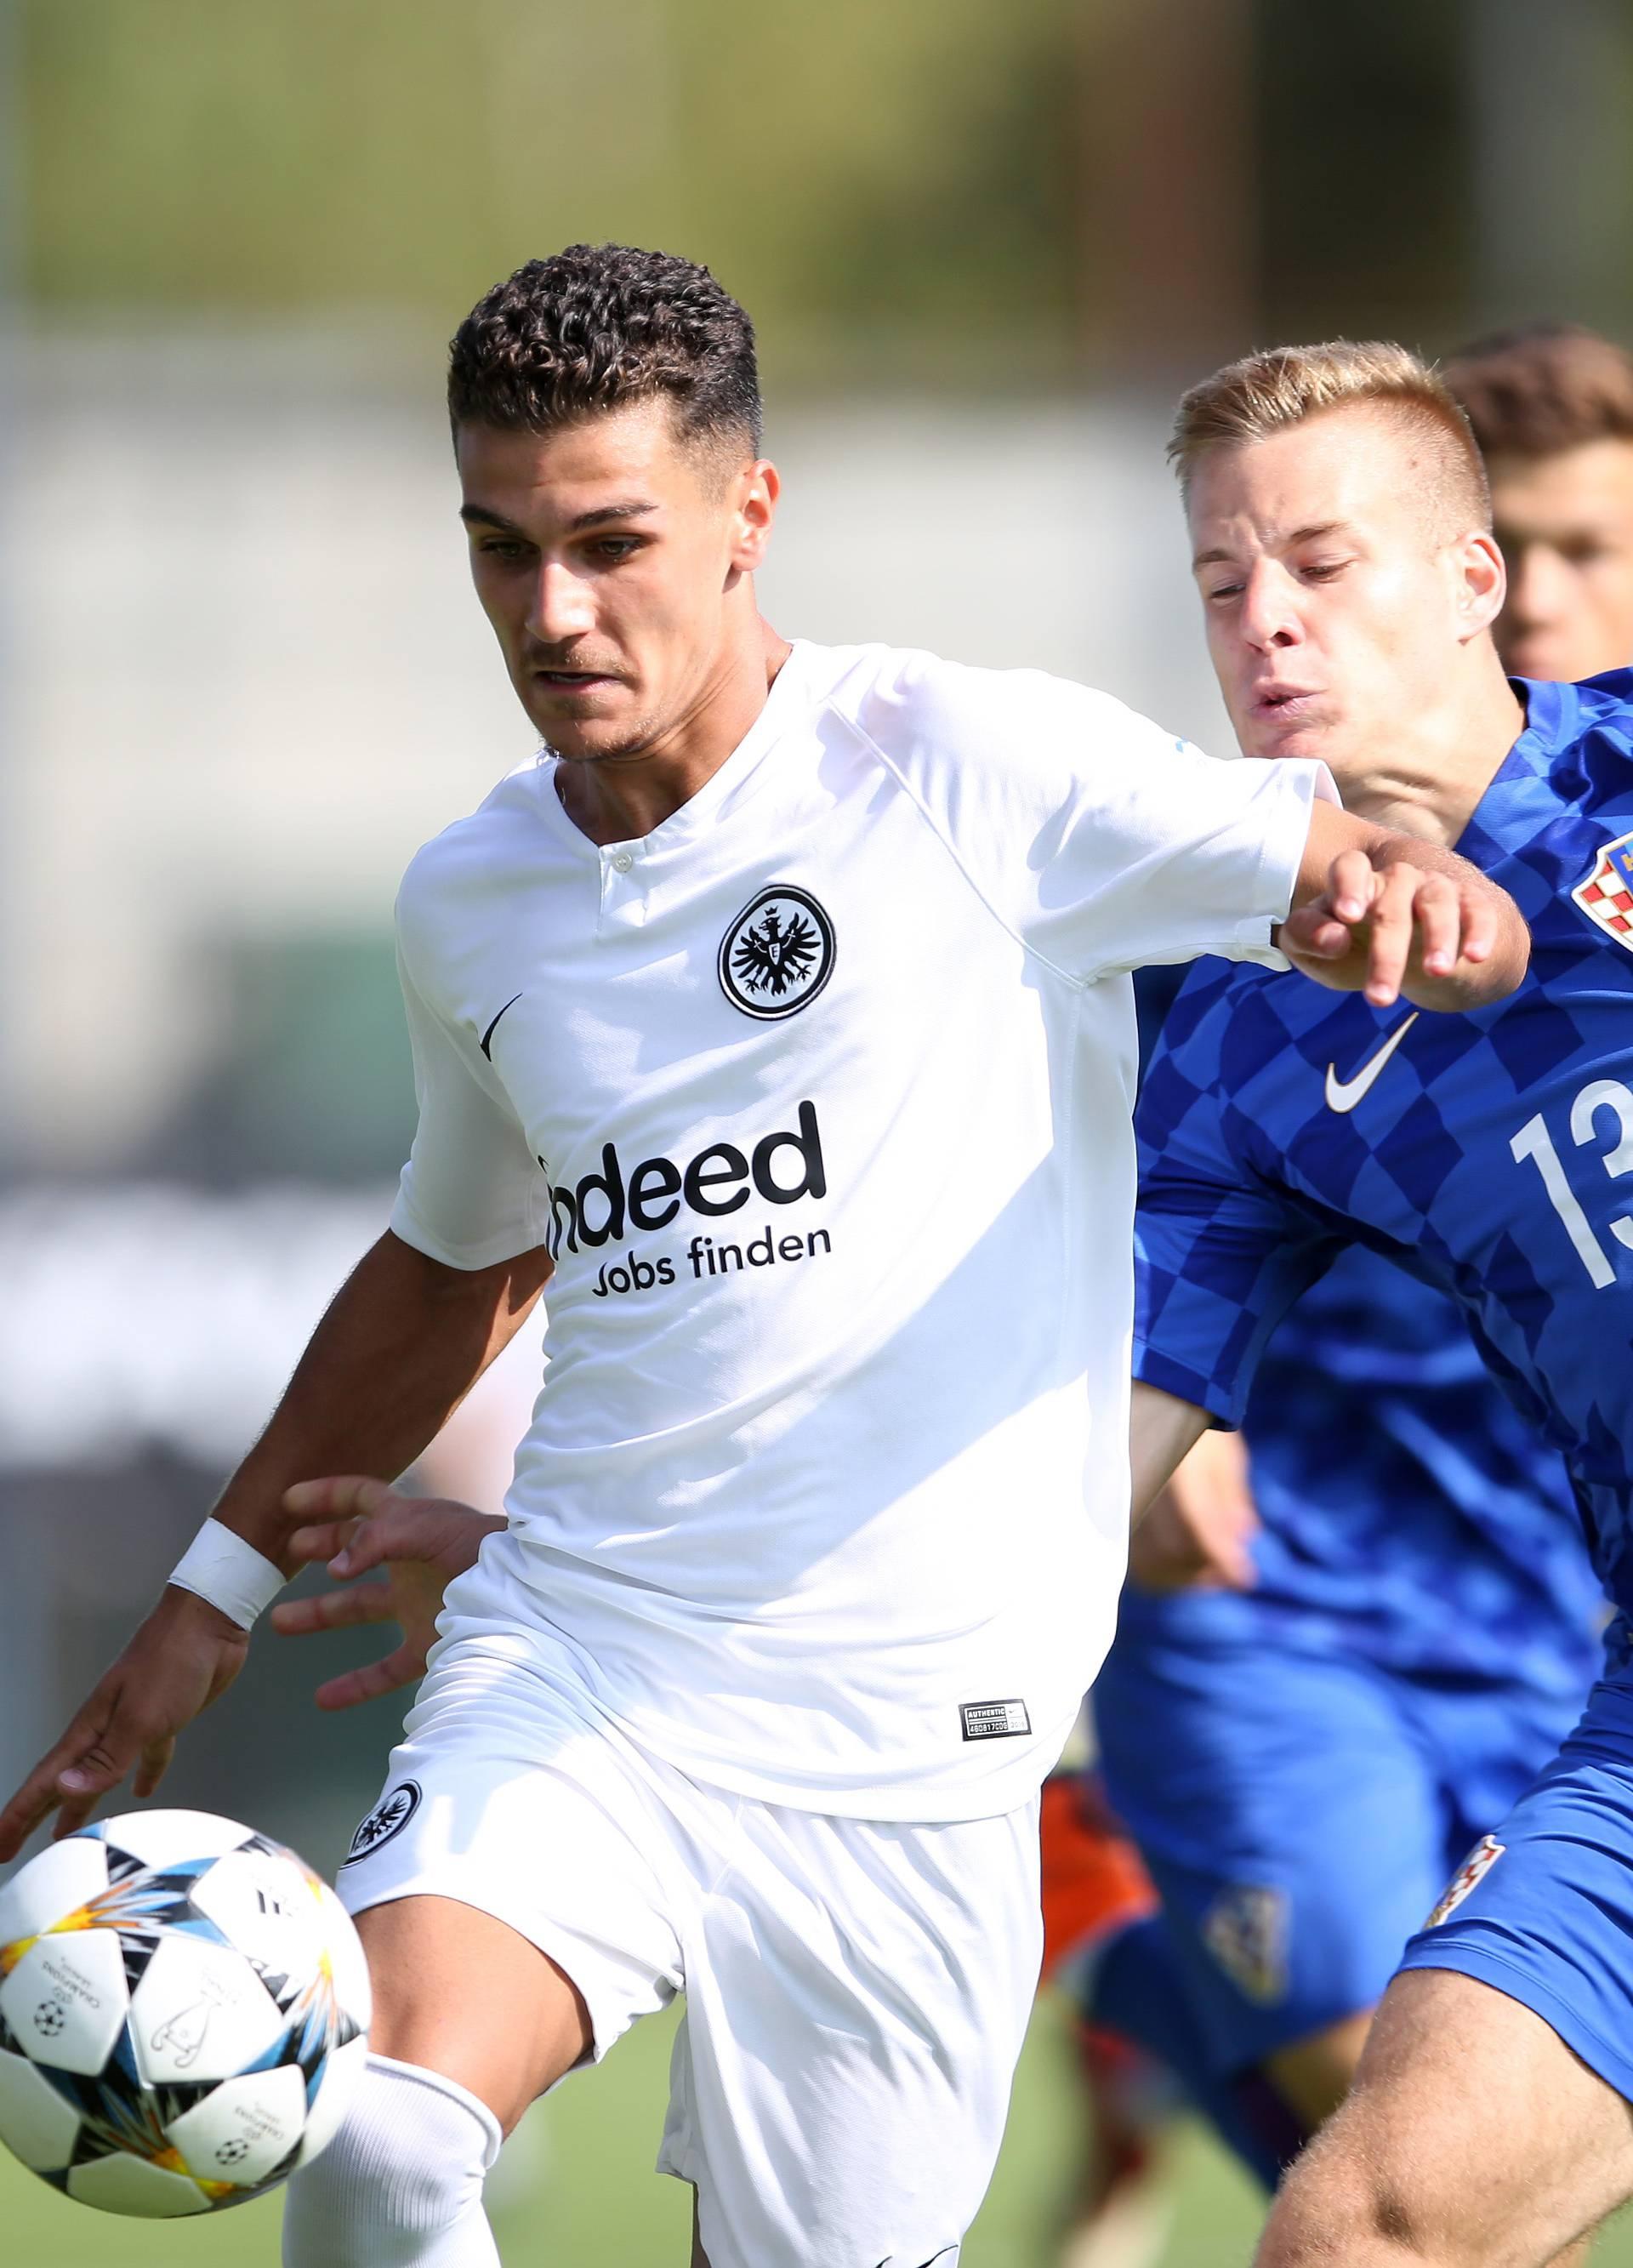 Zagreb: 16. međunarodni turnir Mladen Ramljak, Hrvatska - Eintracht Frankfurt